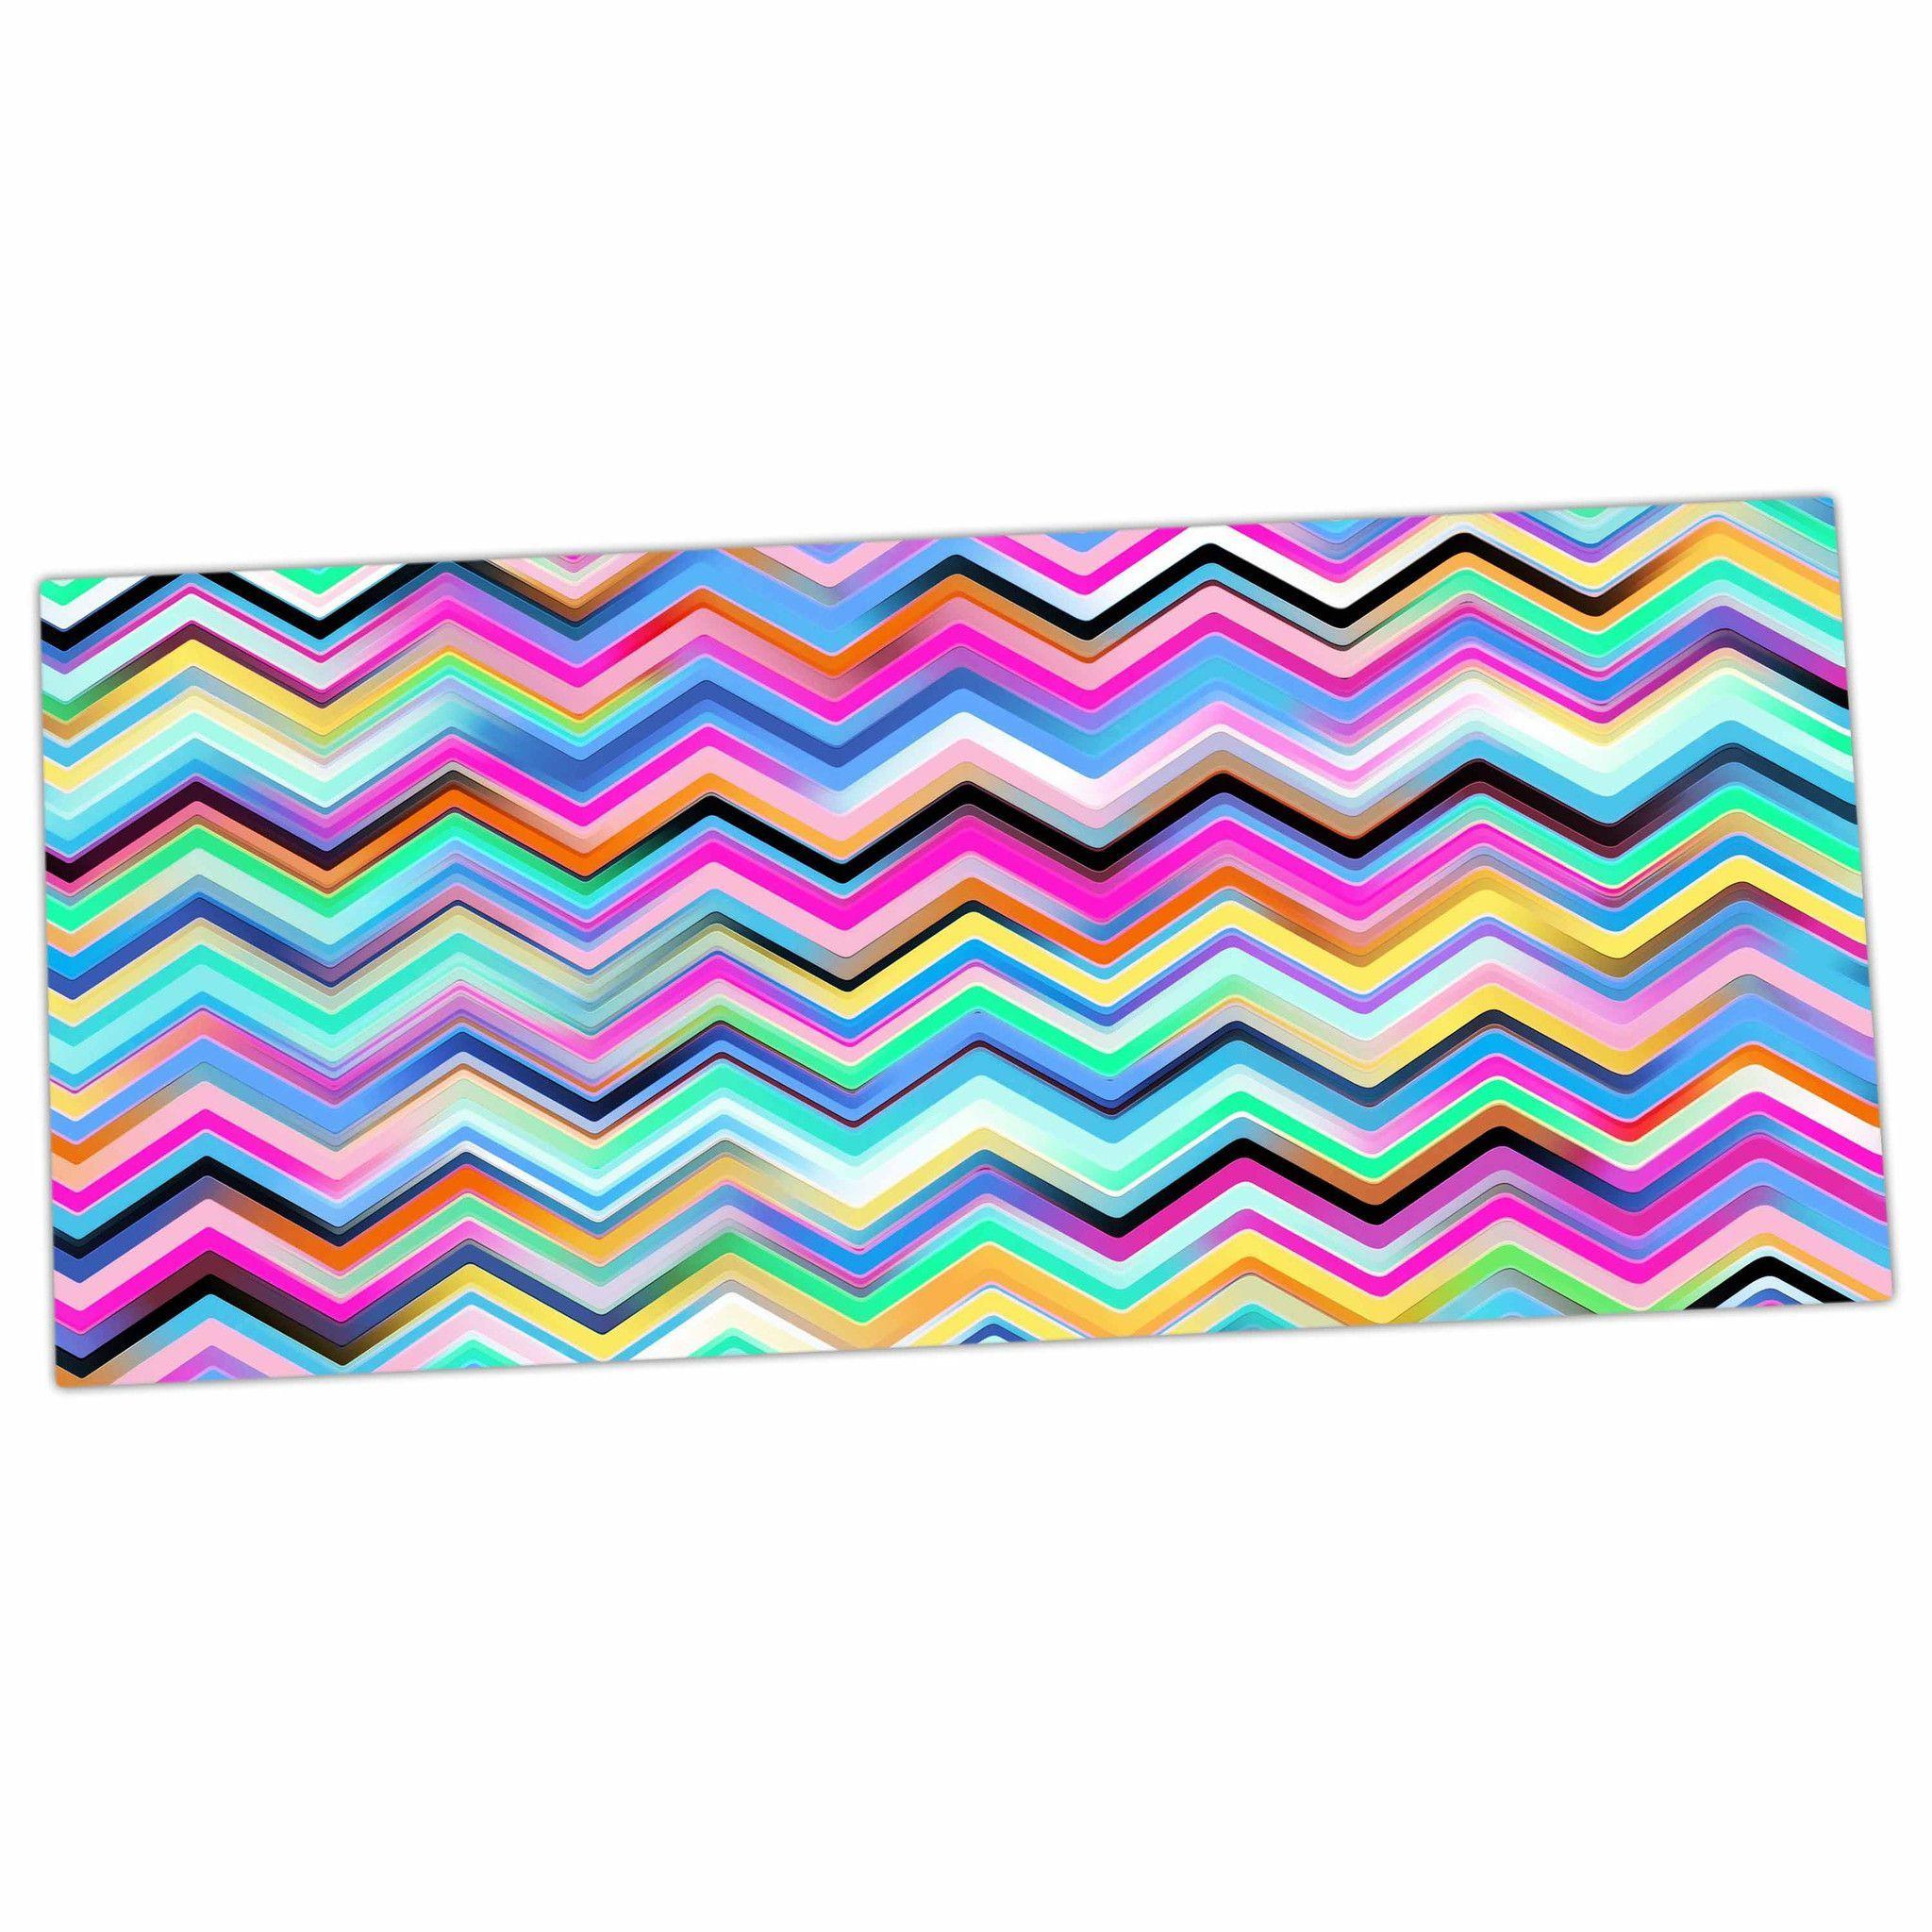 "Dawid Roc ""Colorful Rainbow Chevron"" Multicolor Blue Desk Mat"